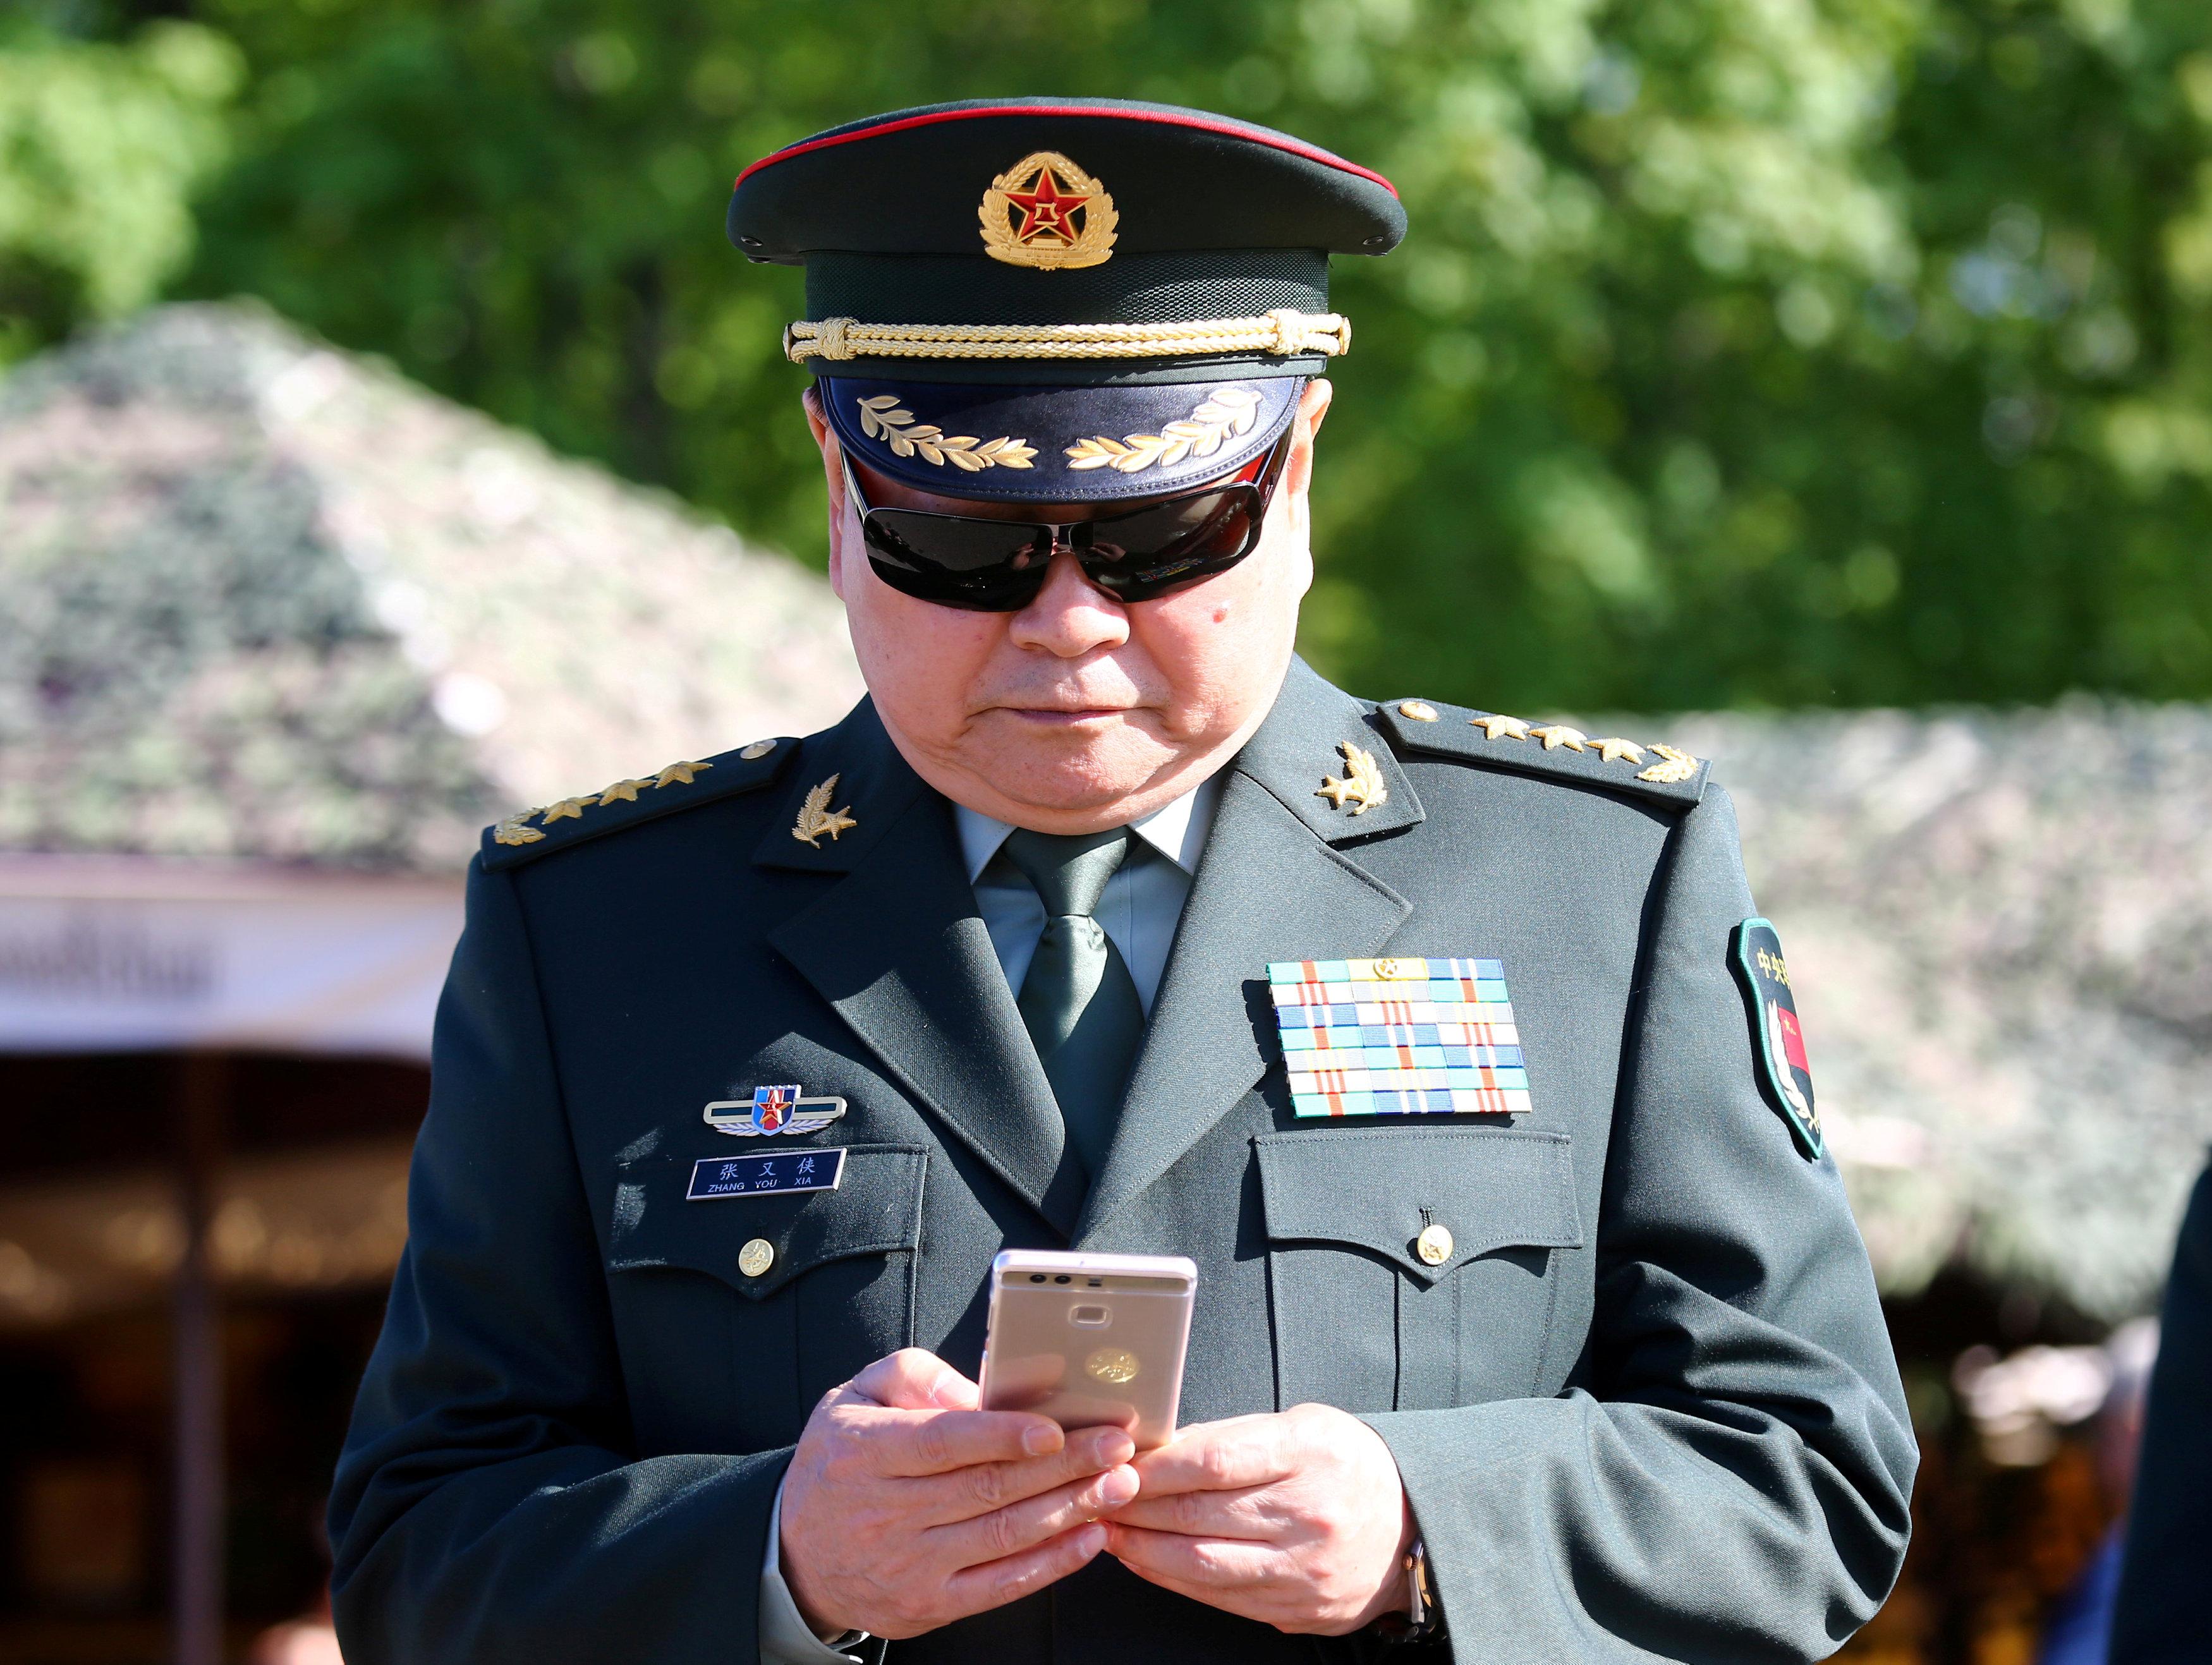 China combat veteran Zhang Youxia, close ally of Xi Jinping, to get promotion